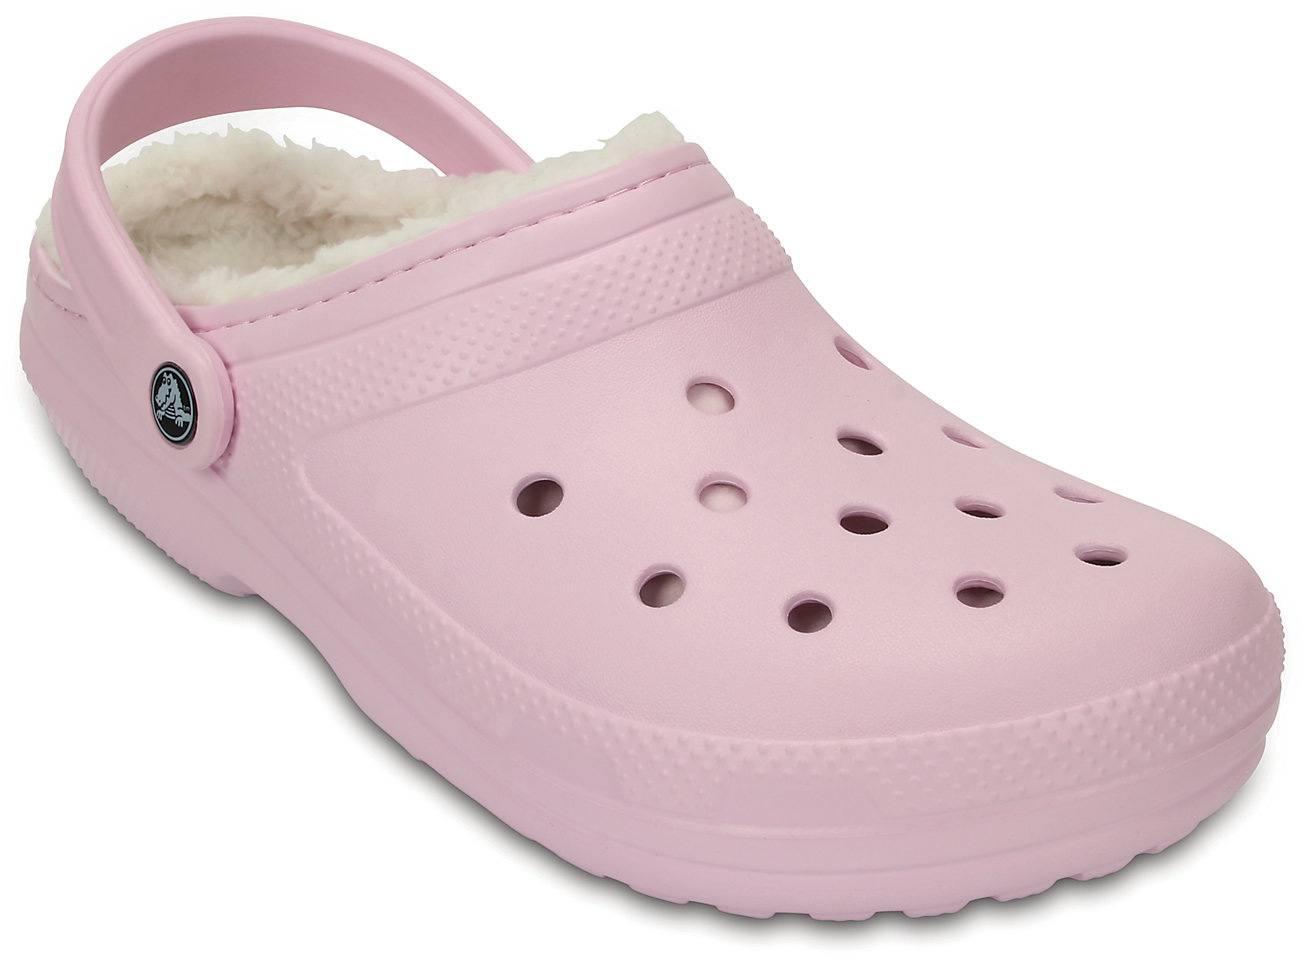 43df56136eeca2 Crocs Classic Fuzz Lined Clog